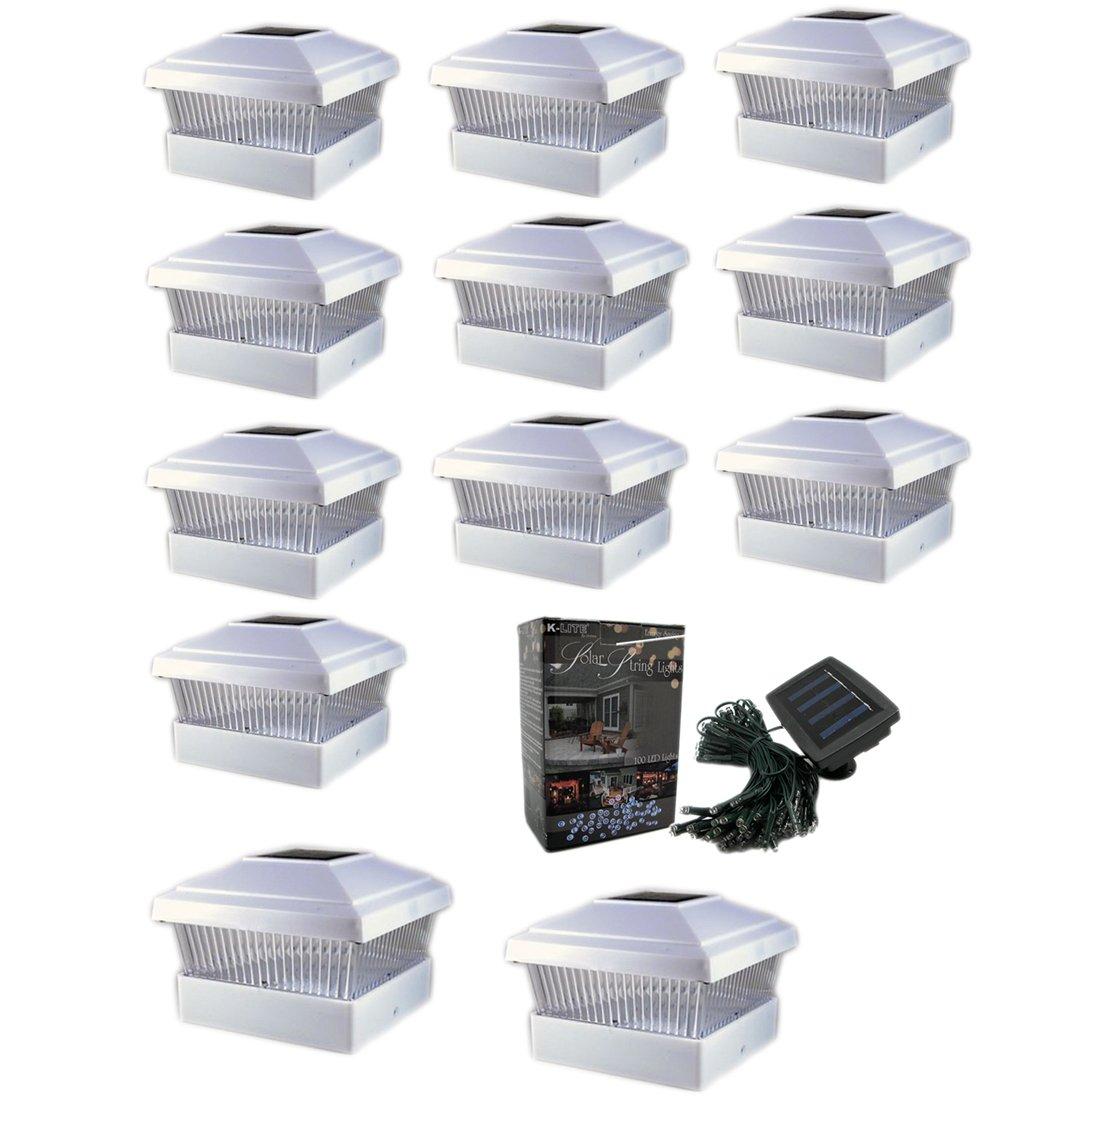 12 Pack 5x5 Outdoor Garden Solar LED (Bright White Color)Post Cap Fence Pathway Landscape Deck Square Decoration Light + Free Bonus 1- 100 LED 40Ft String Solar Decoration Solar Light Bundle